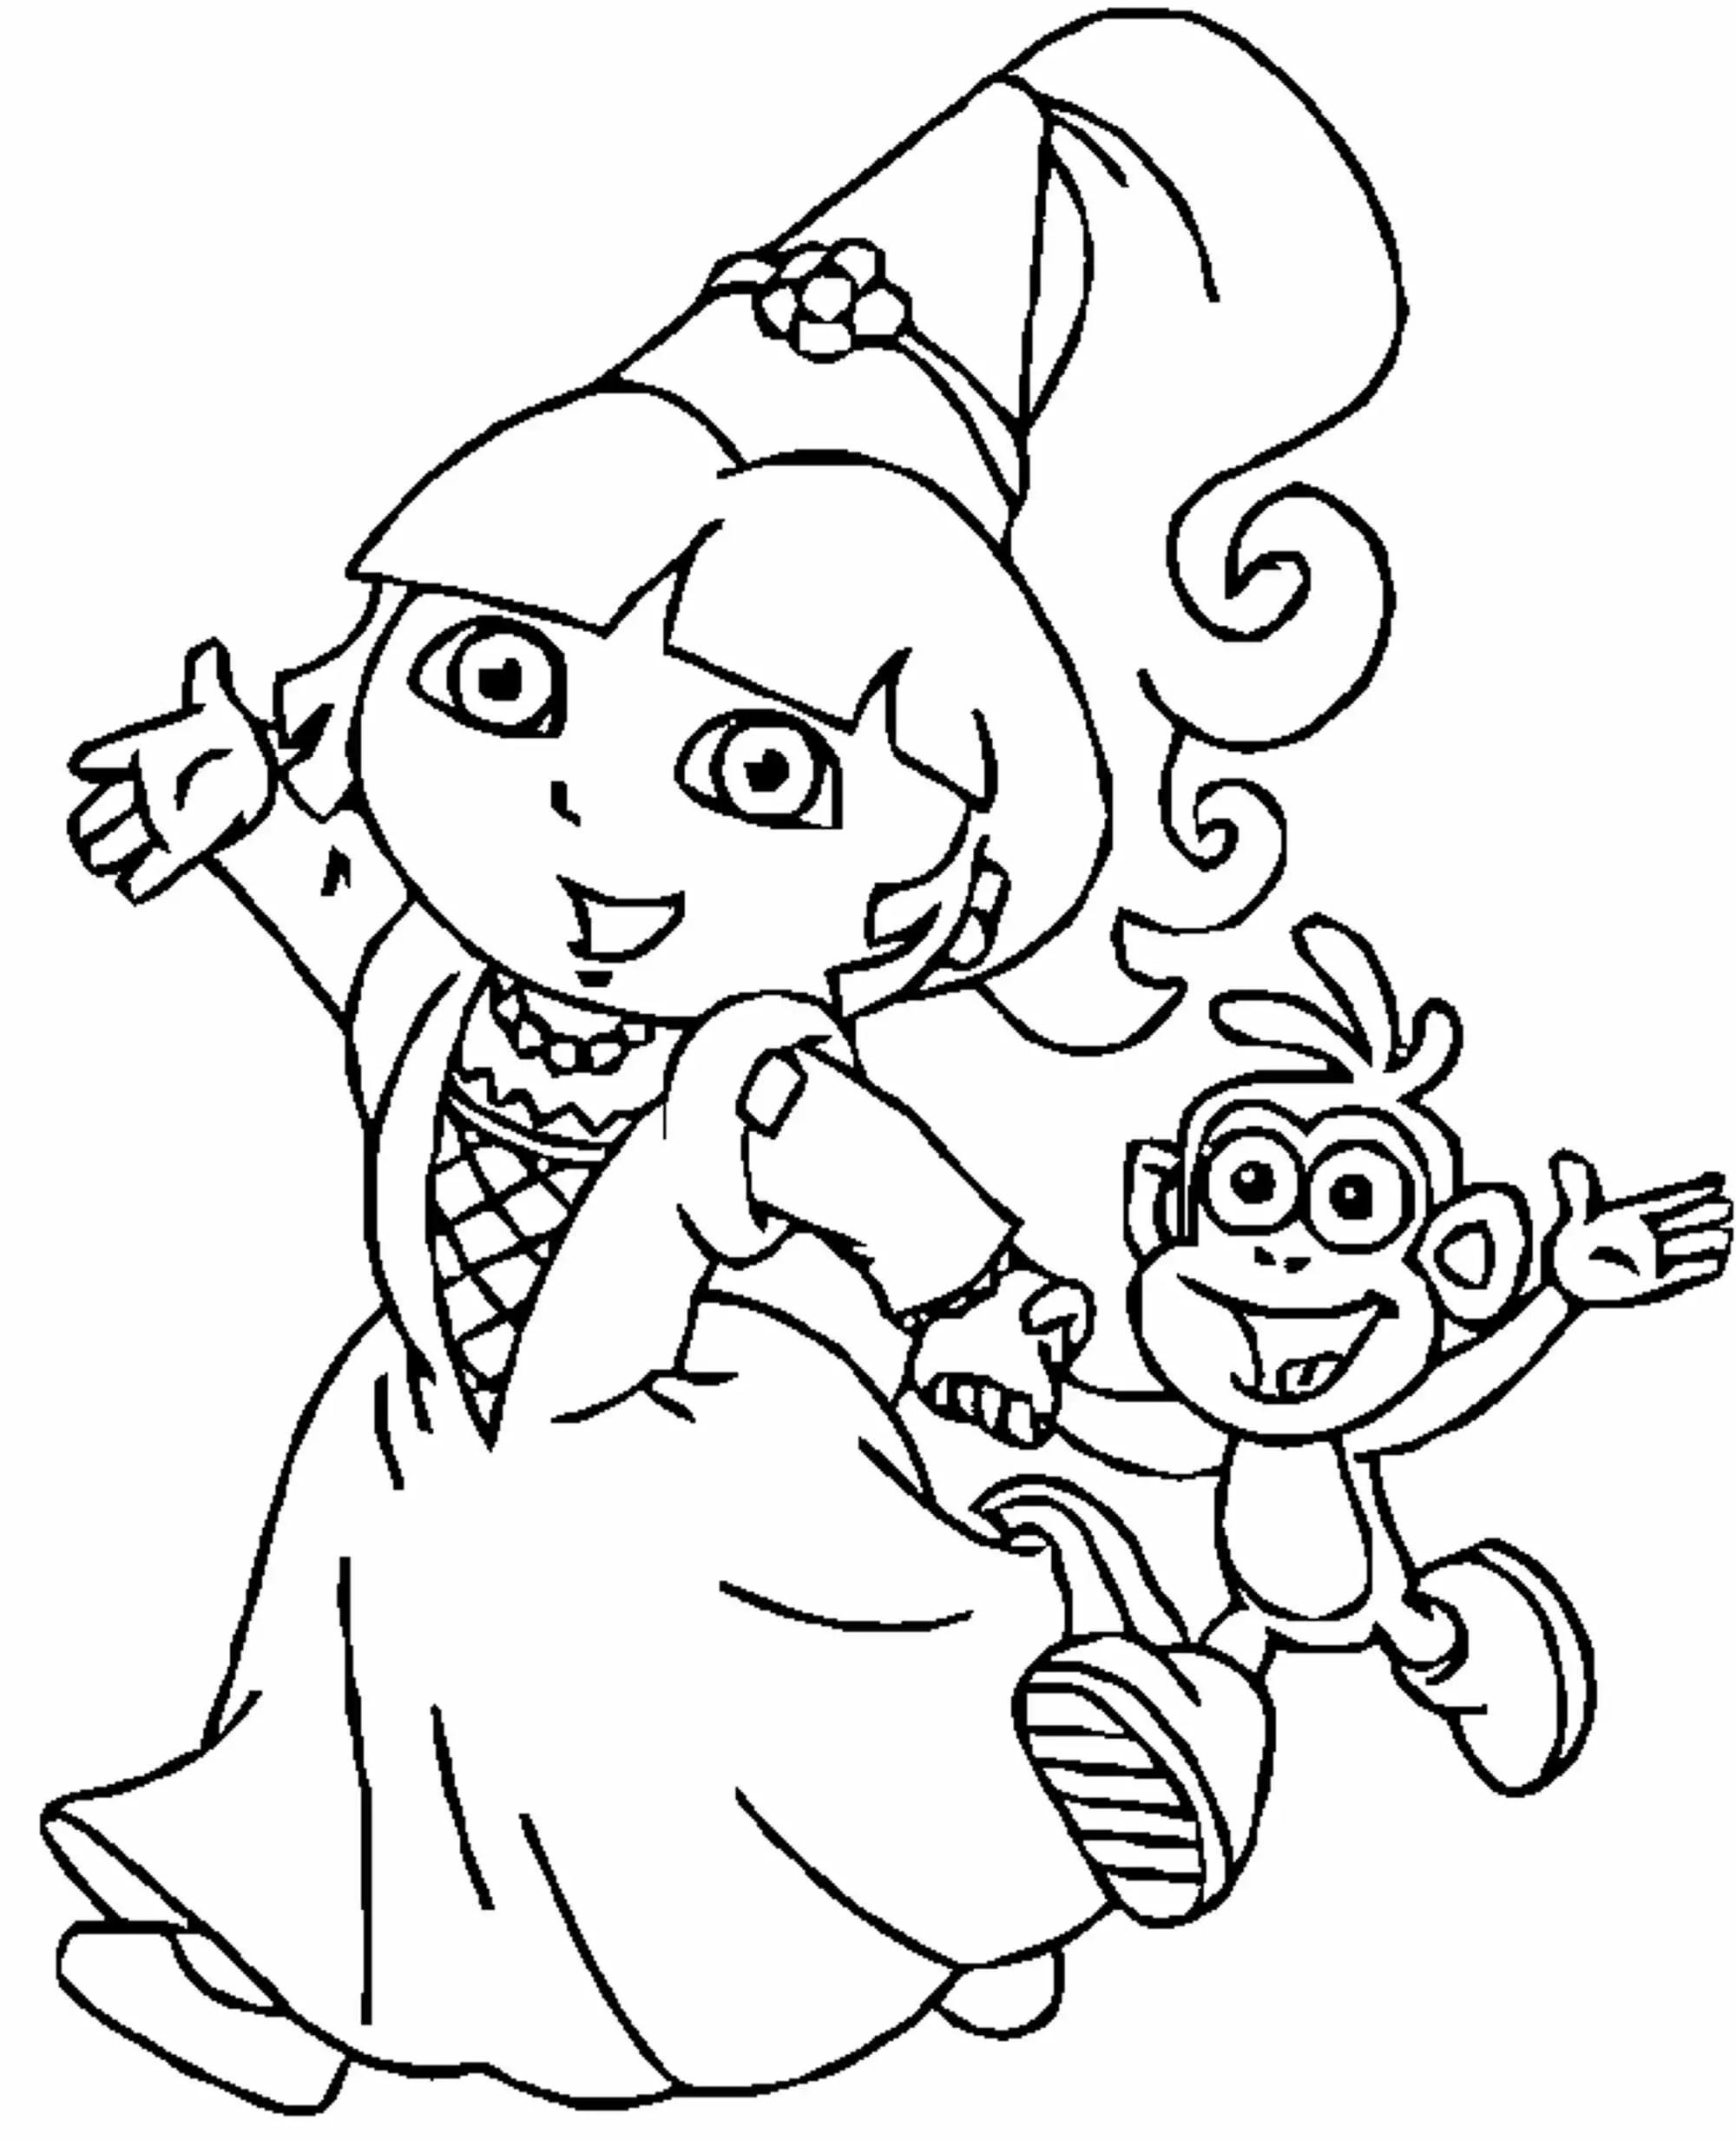 Dora Princess Coloring Pages Bestappsforkids